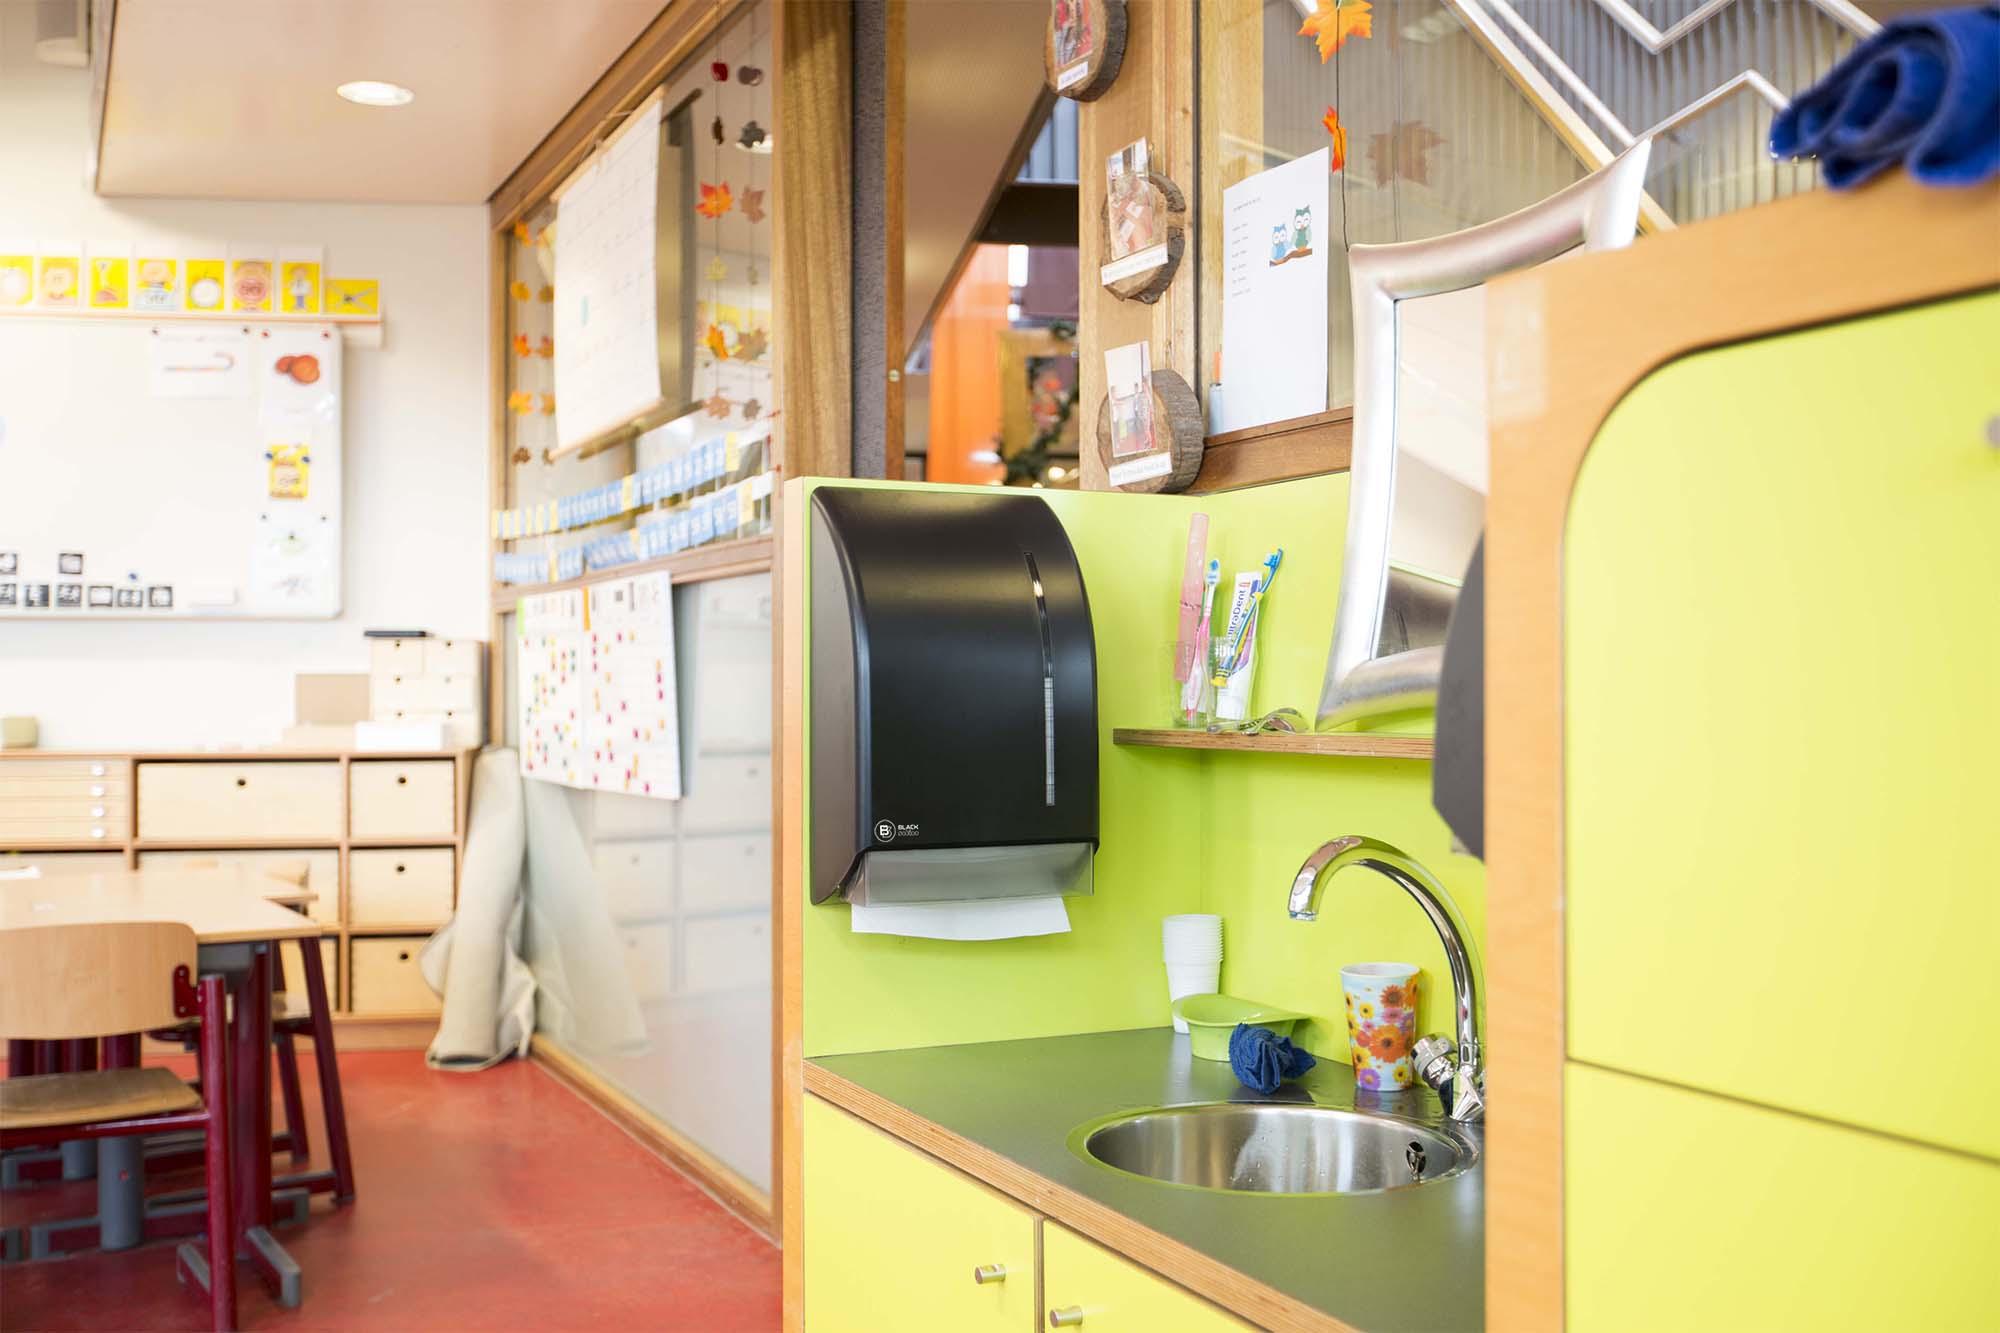 Sanitaire hygiëne en schoonmaak op scholen: wat kan jij doen?